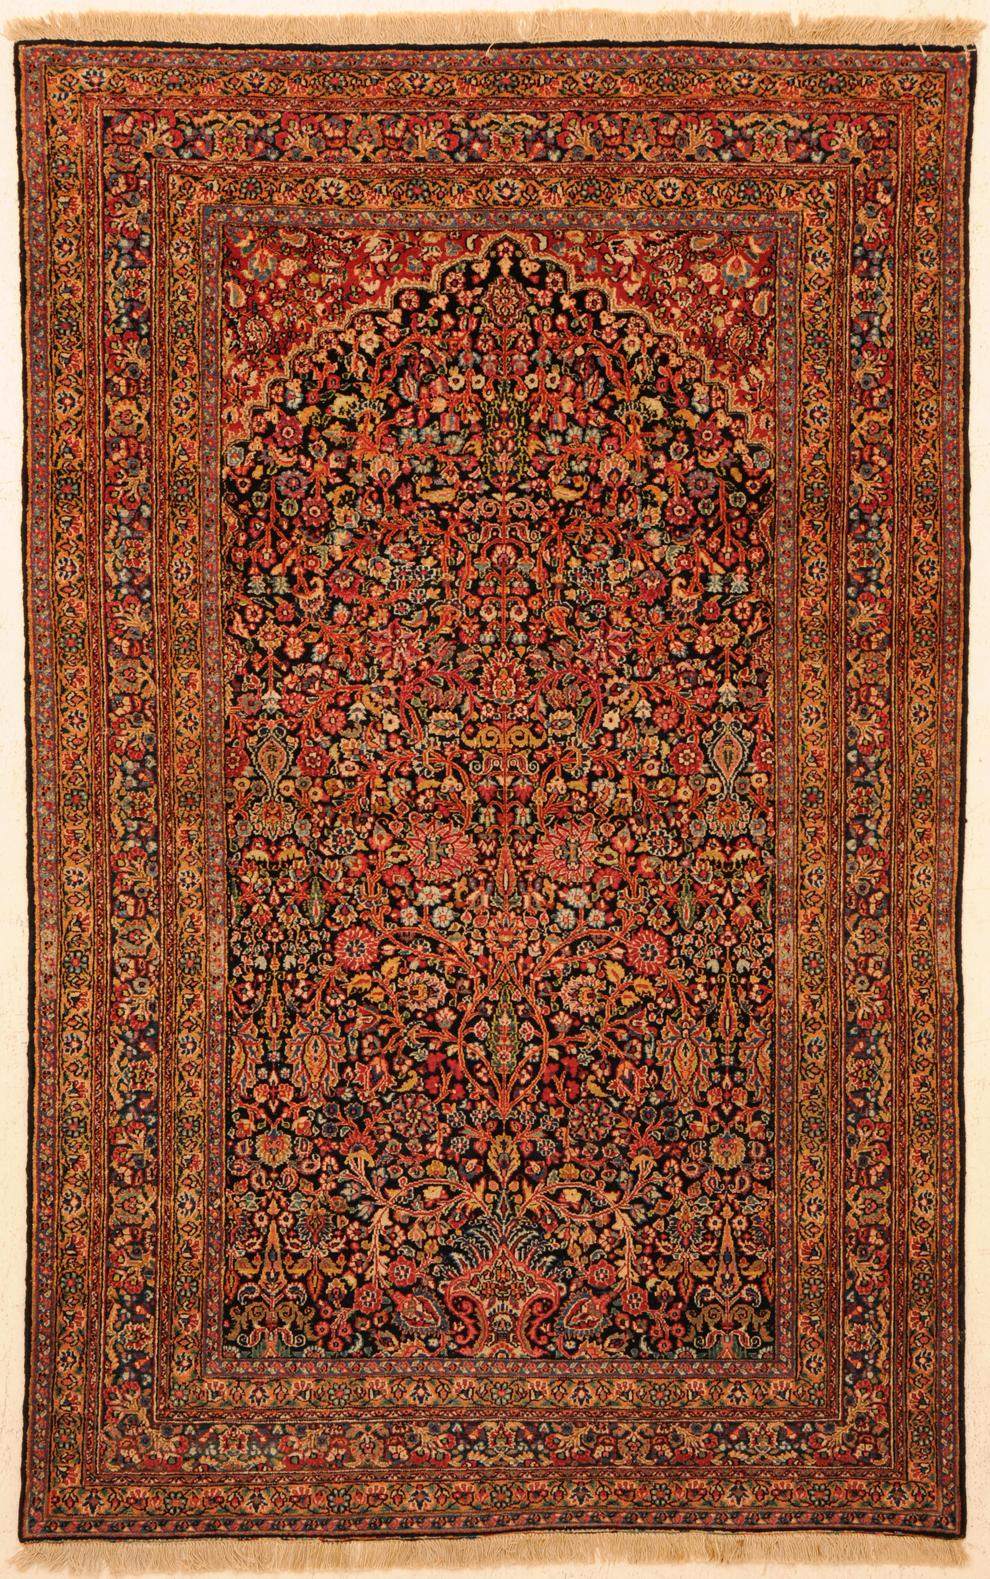 mashad 4 39 3 x 6 39 9 catalina rug. Black Bedroom Furniture Sets. Home Design Ideas